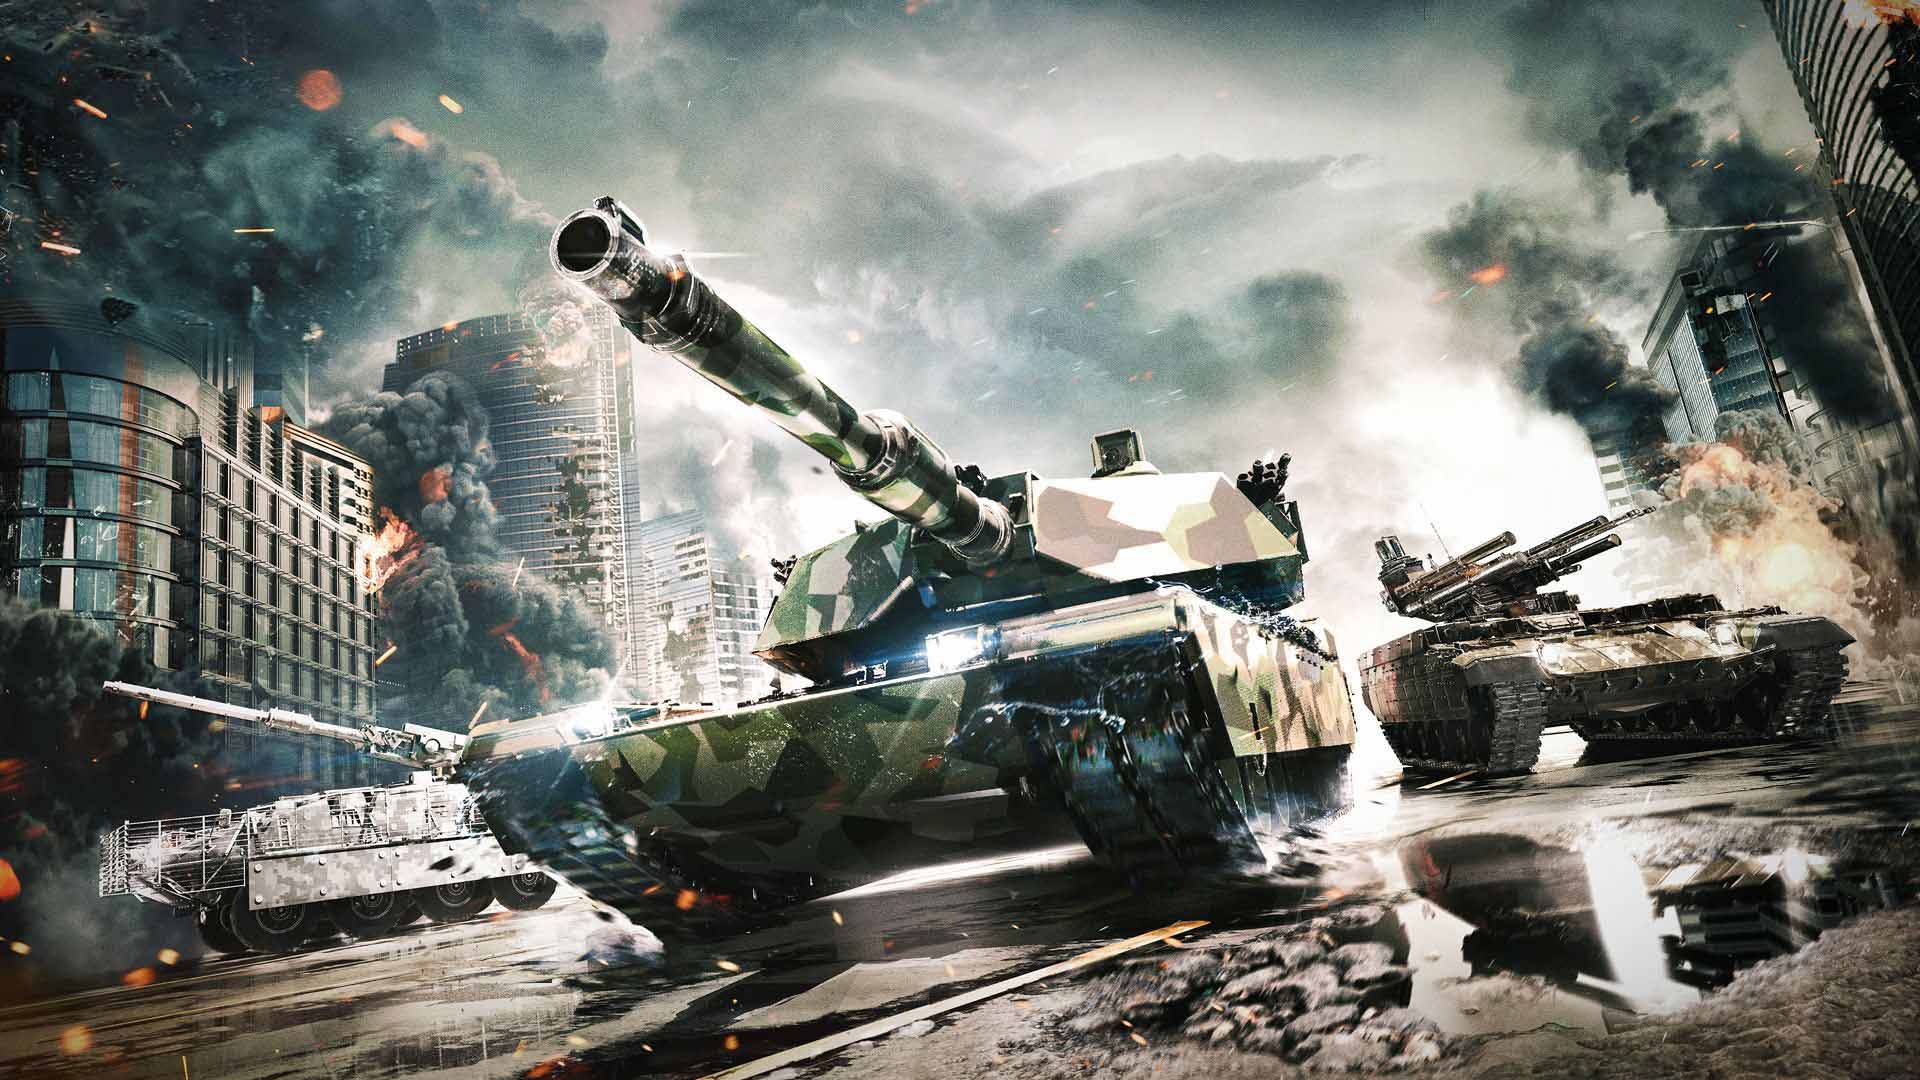 Juegos gratis de Xbox One para 2018 (lista actualizada) 5